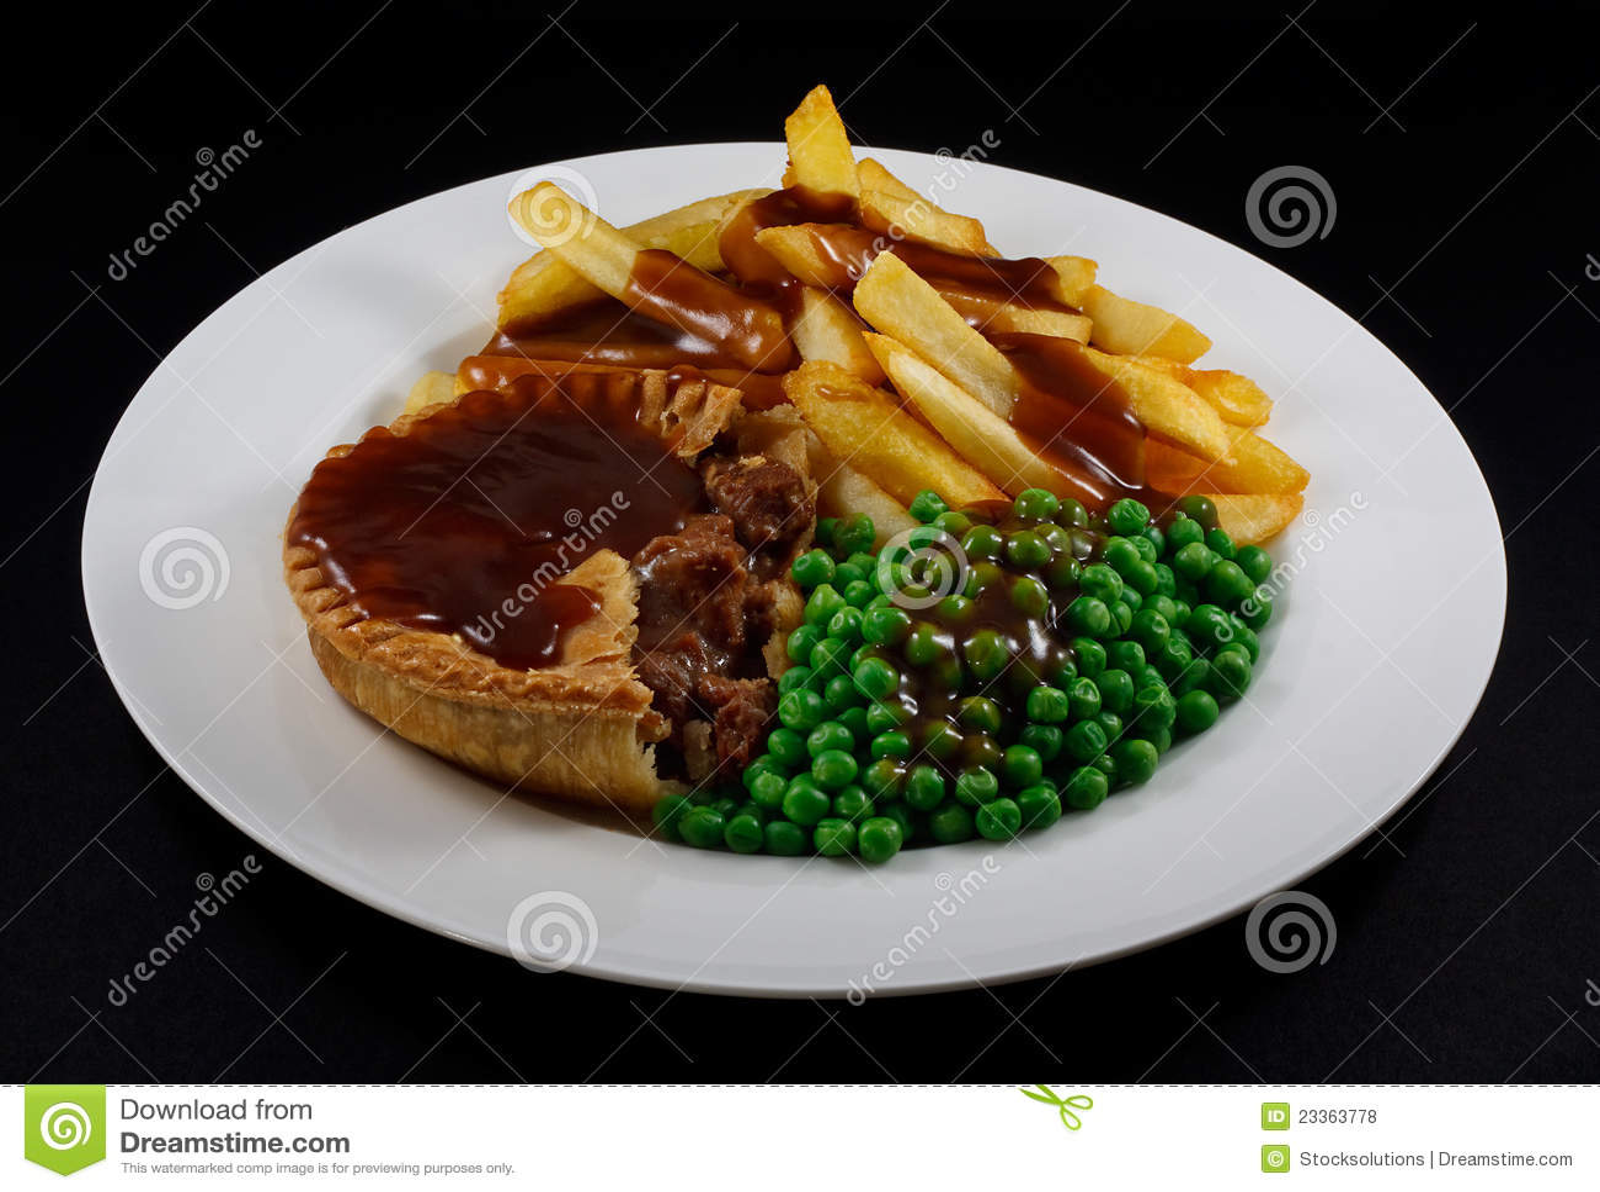 Steak Pie, Fries, Peas And Gravy Royalty Free Stock Photos ...